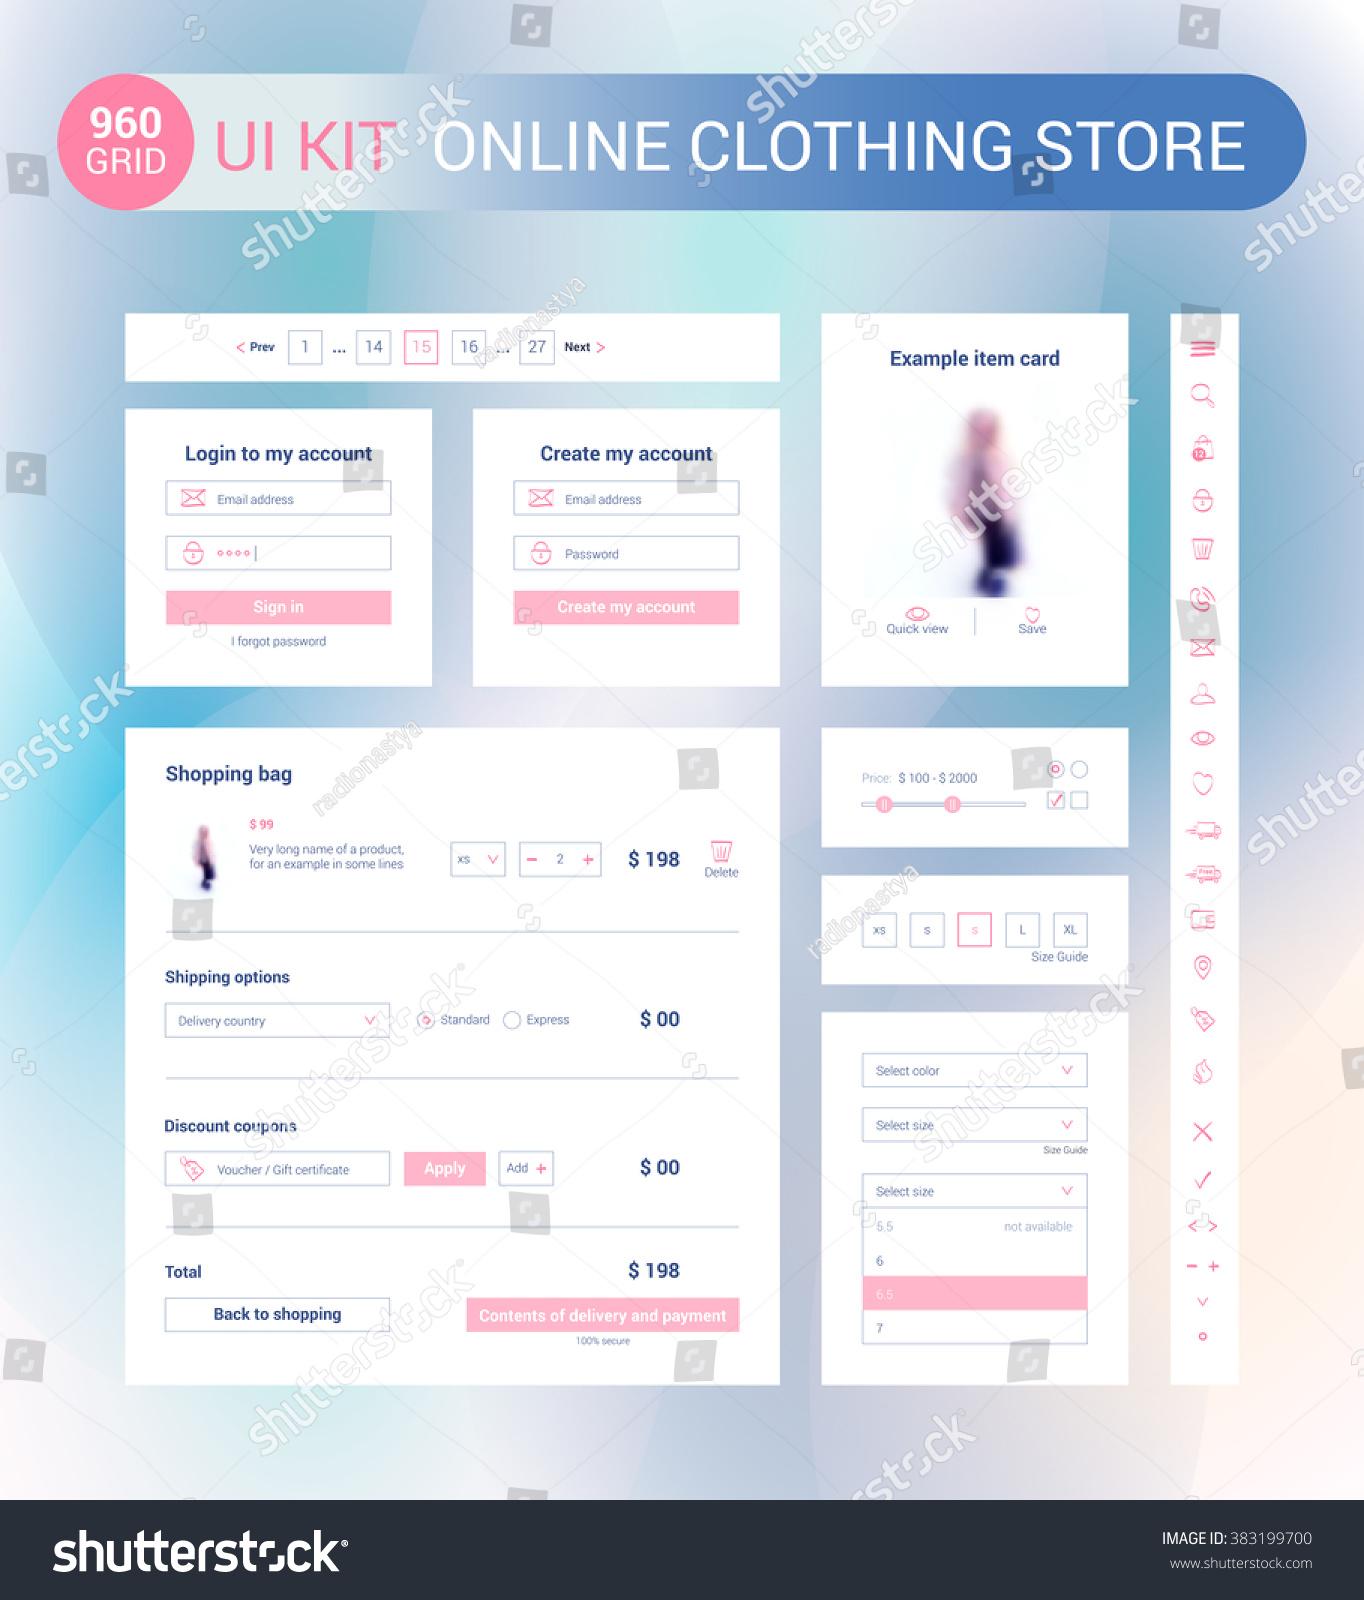 Ui Ux Kit Online Clothing Store Stock Vector 383199700 - Shutterstock